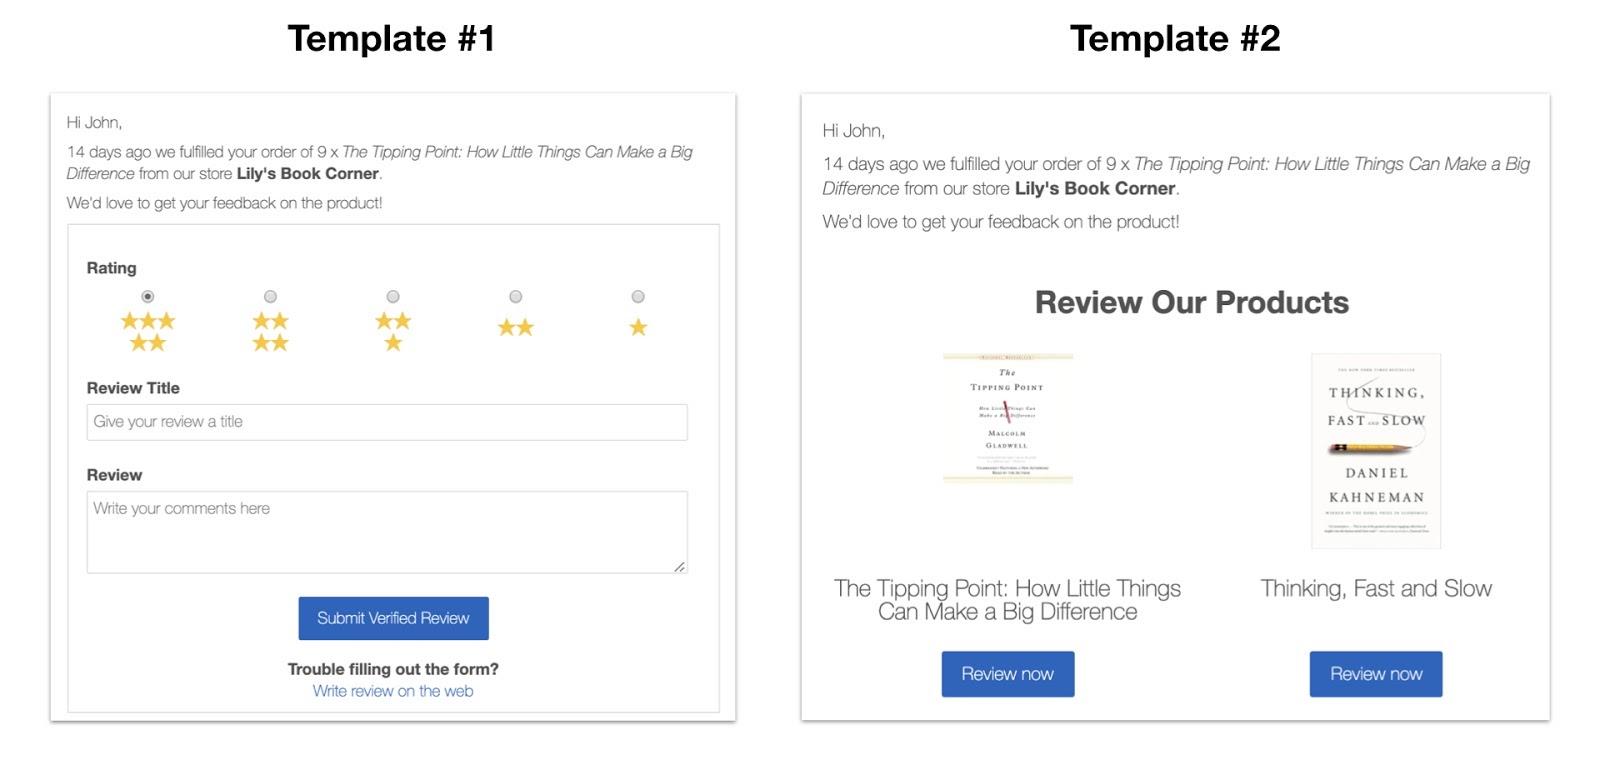 A/B testing templates